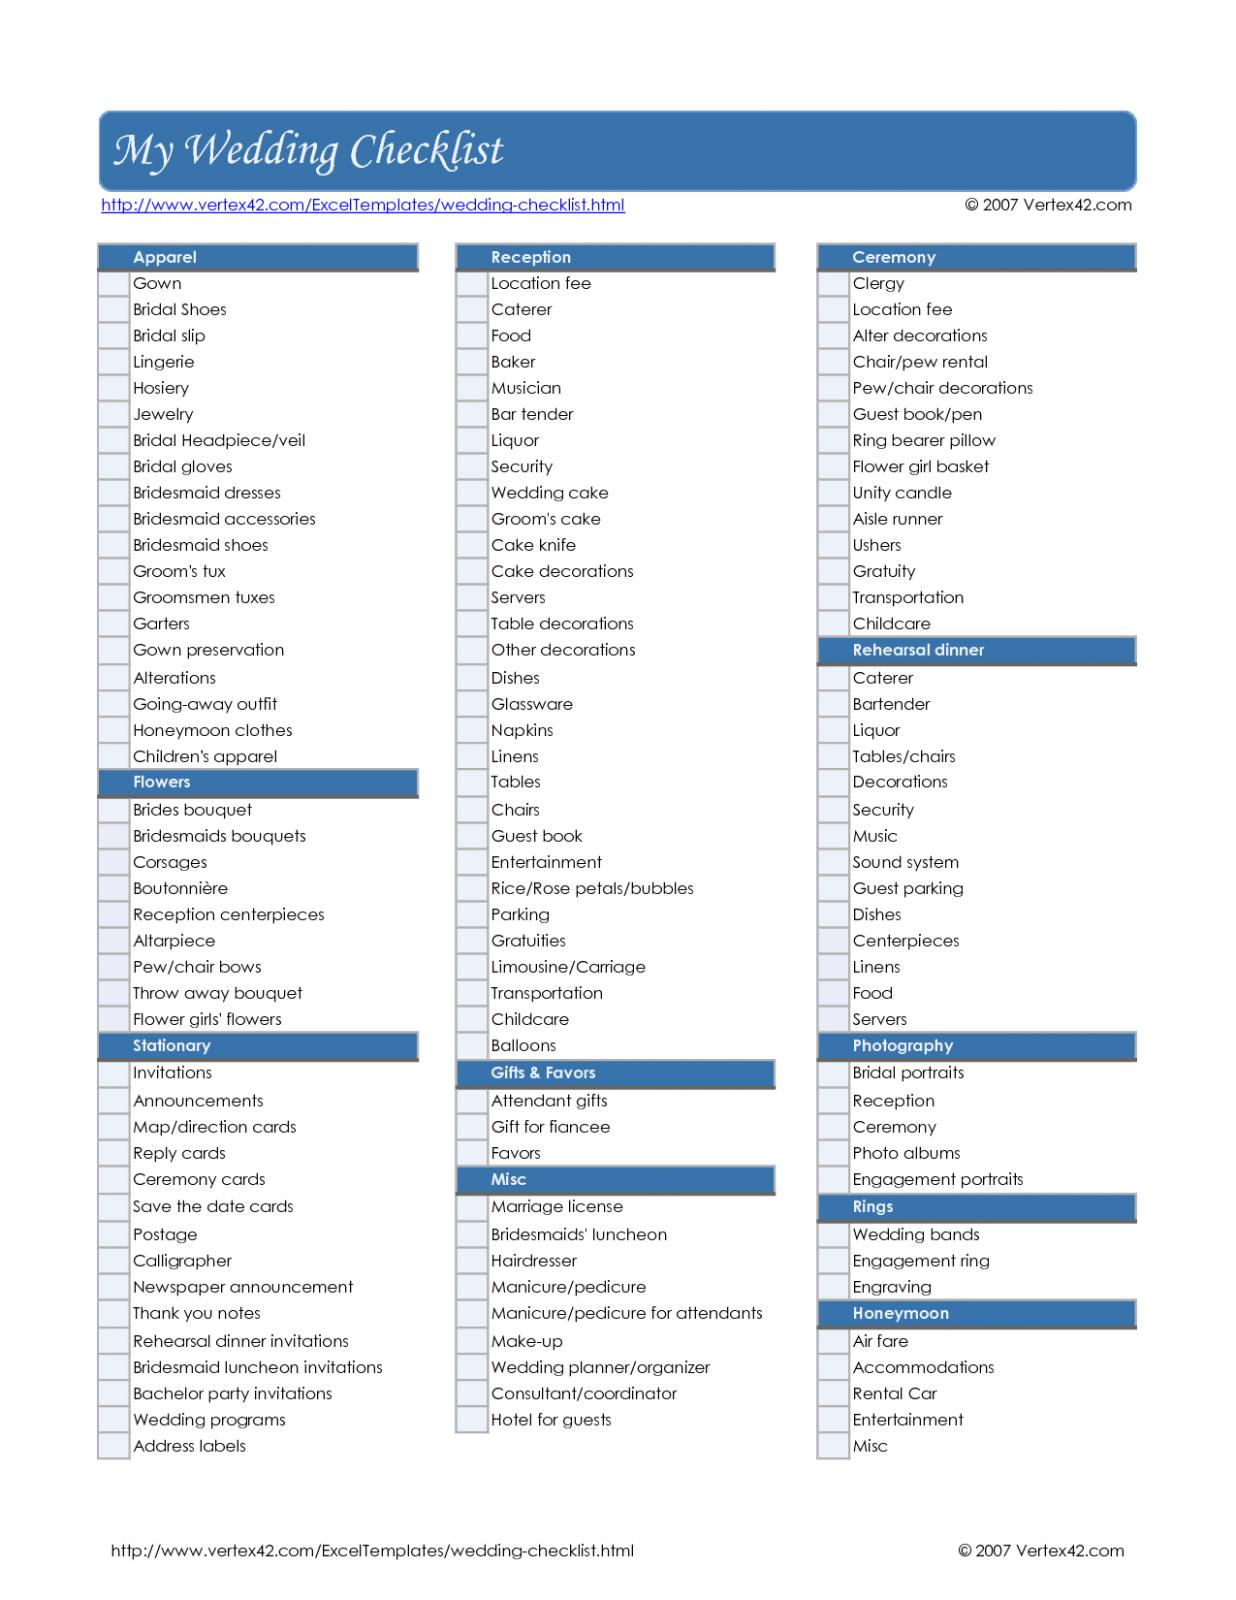 Complete Wedding Checklist Free Printable Complete